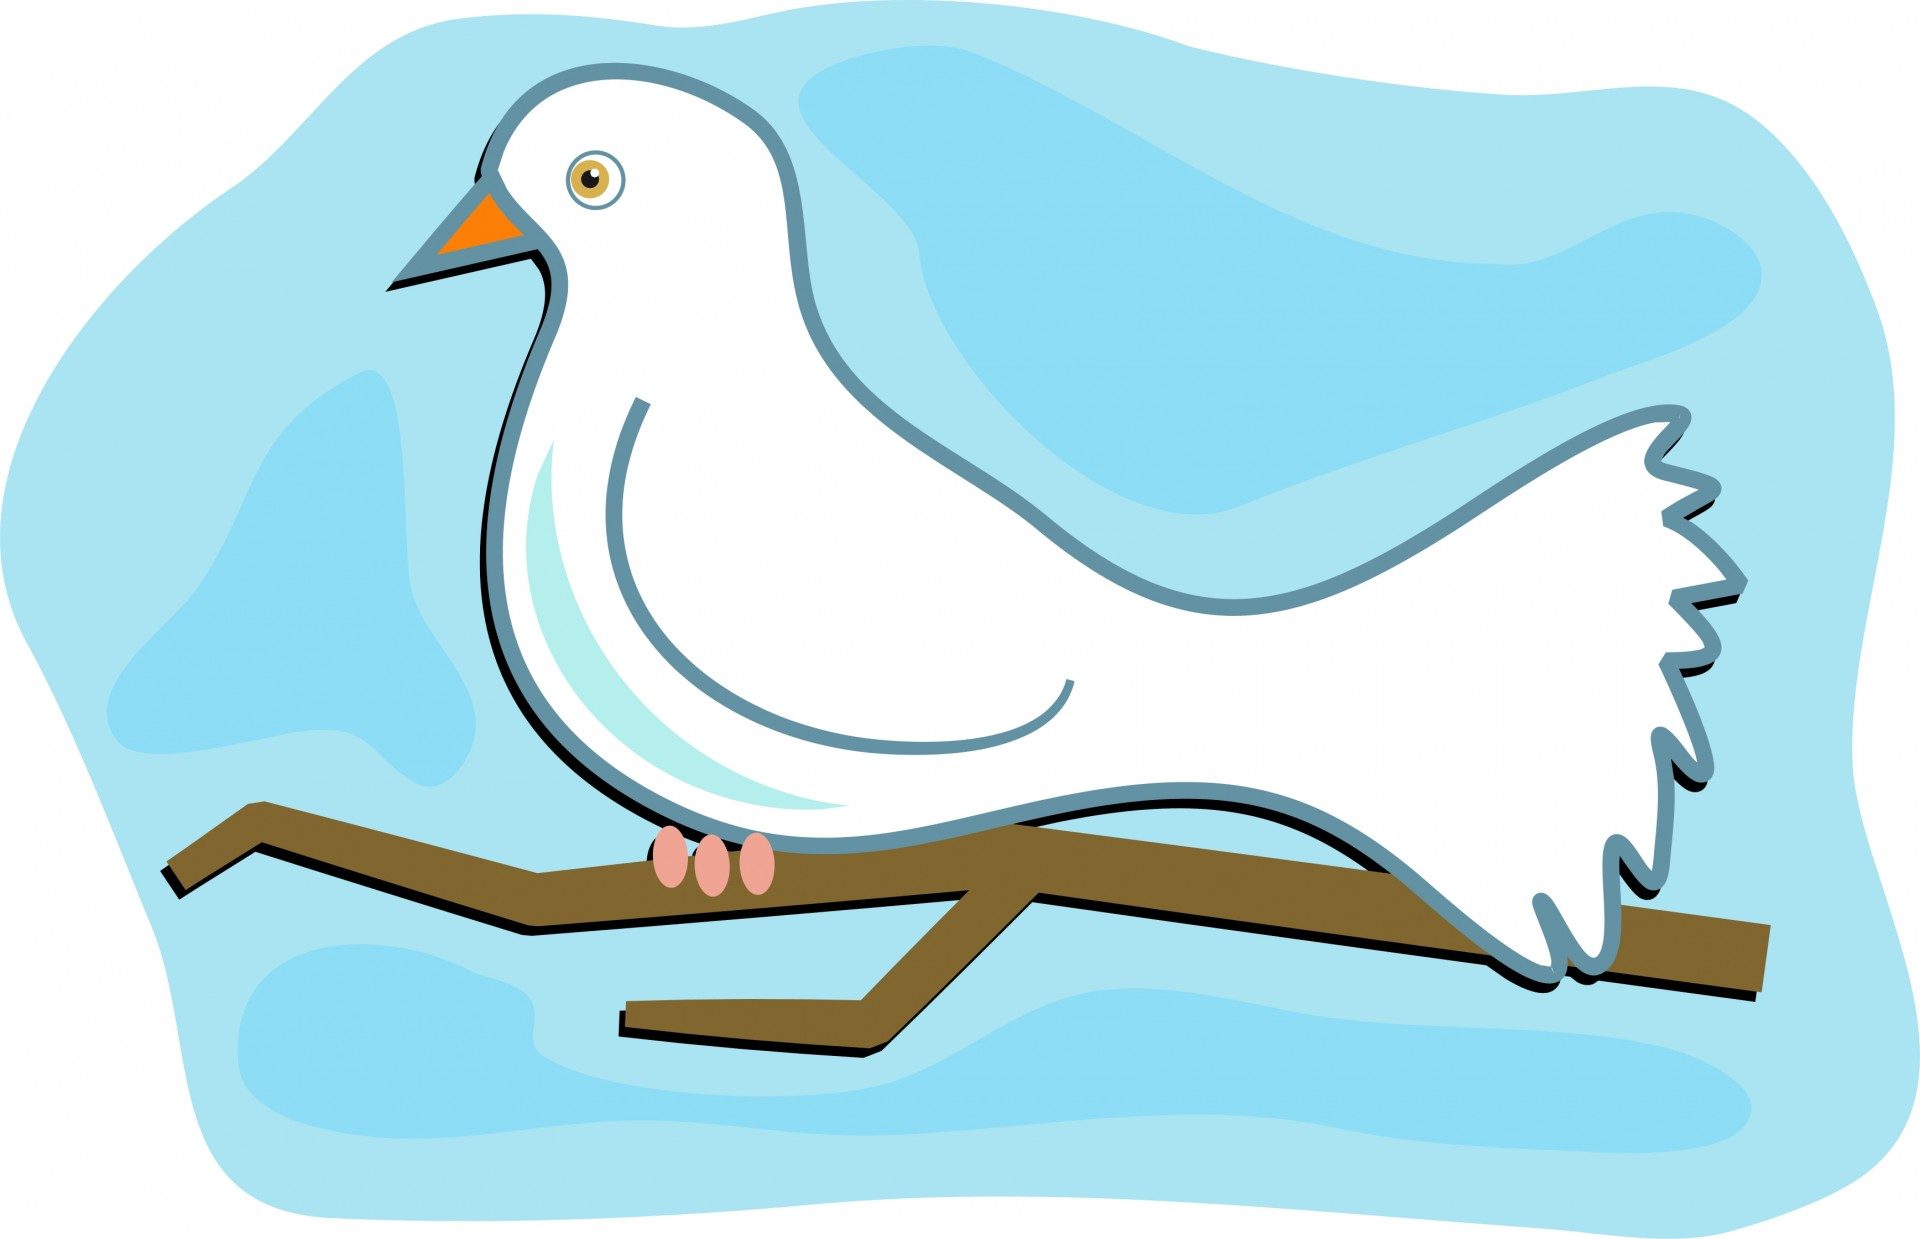 1920x1239 White Dove Clip Art Free Stock Photo